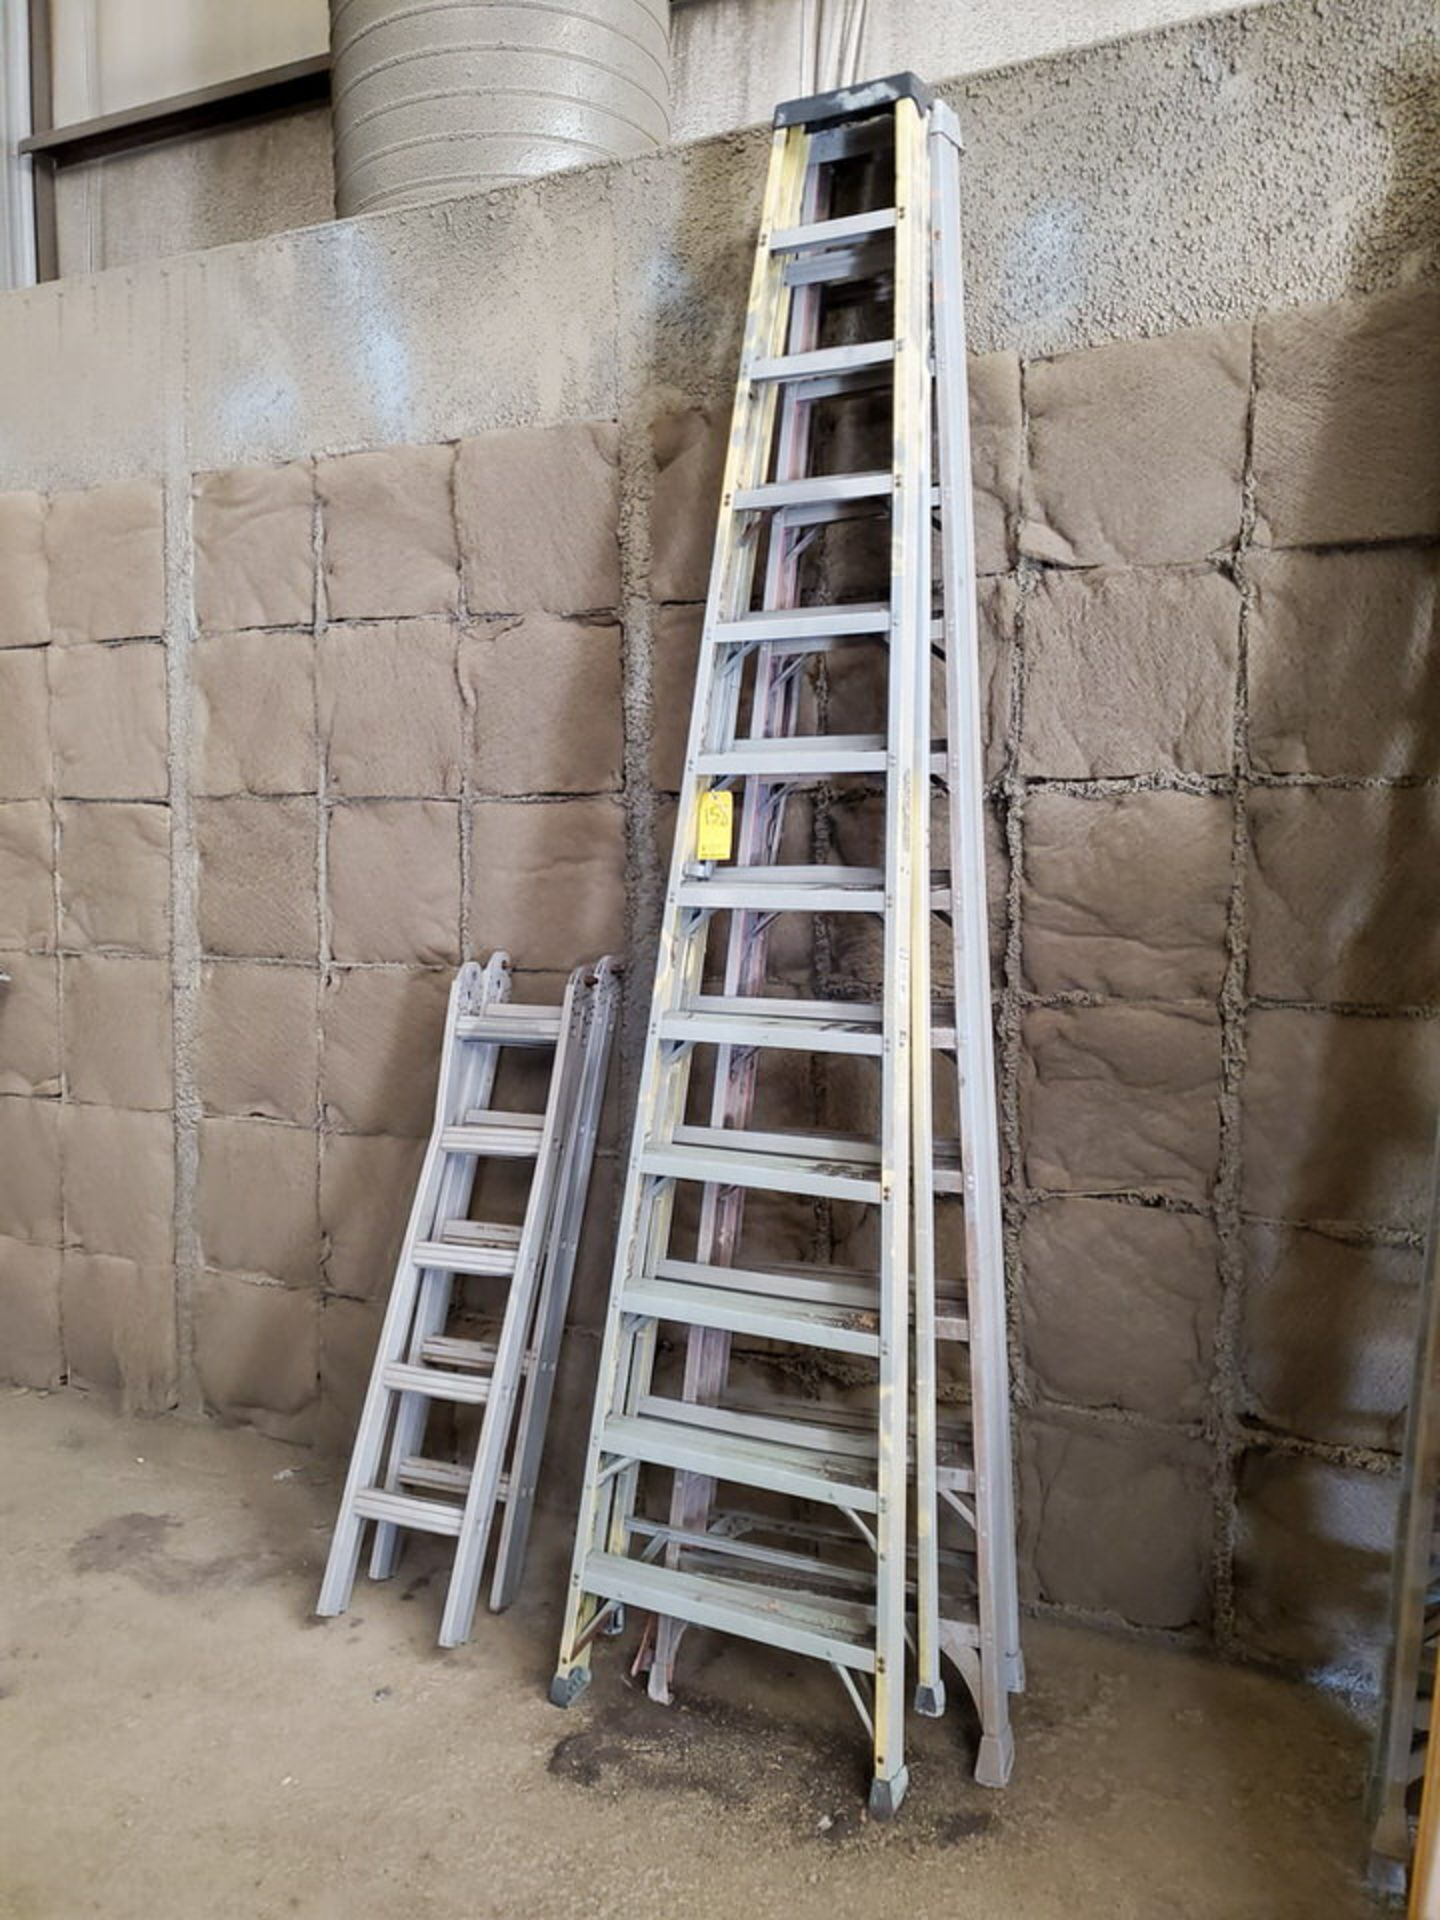 (4) Assorted Fiberglass Platform Ladders Sizes: (2) 4', (2) 14' - Image 2 of 4